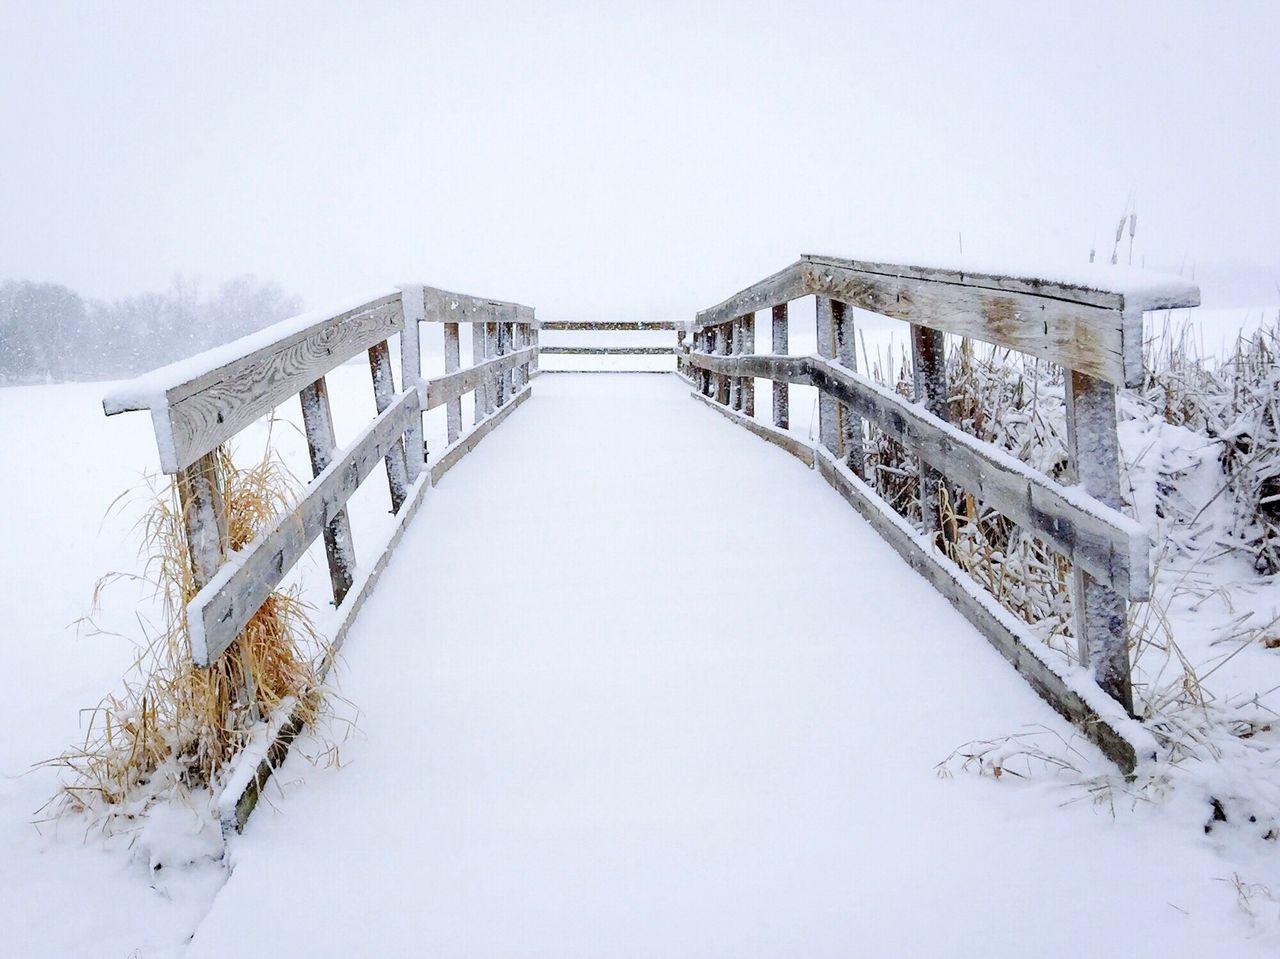 Snow Covered Footbridge Against Sky